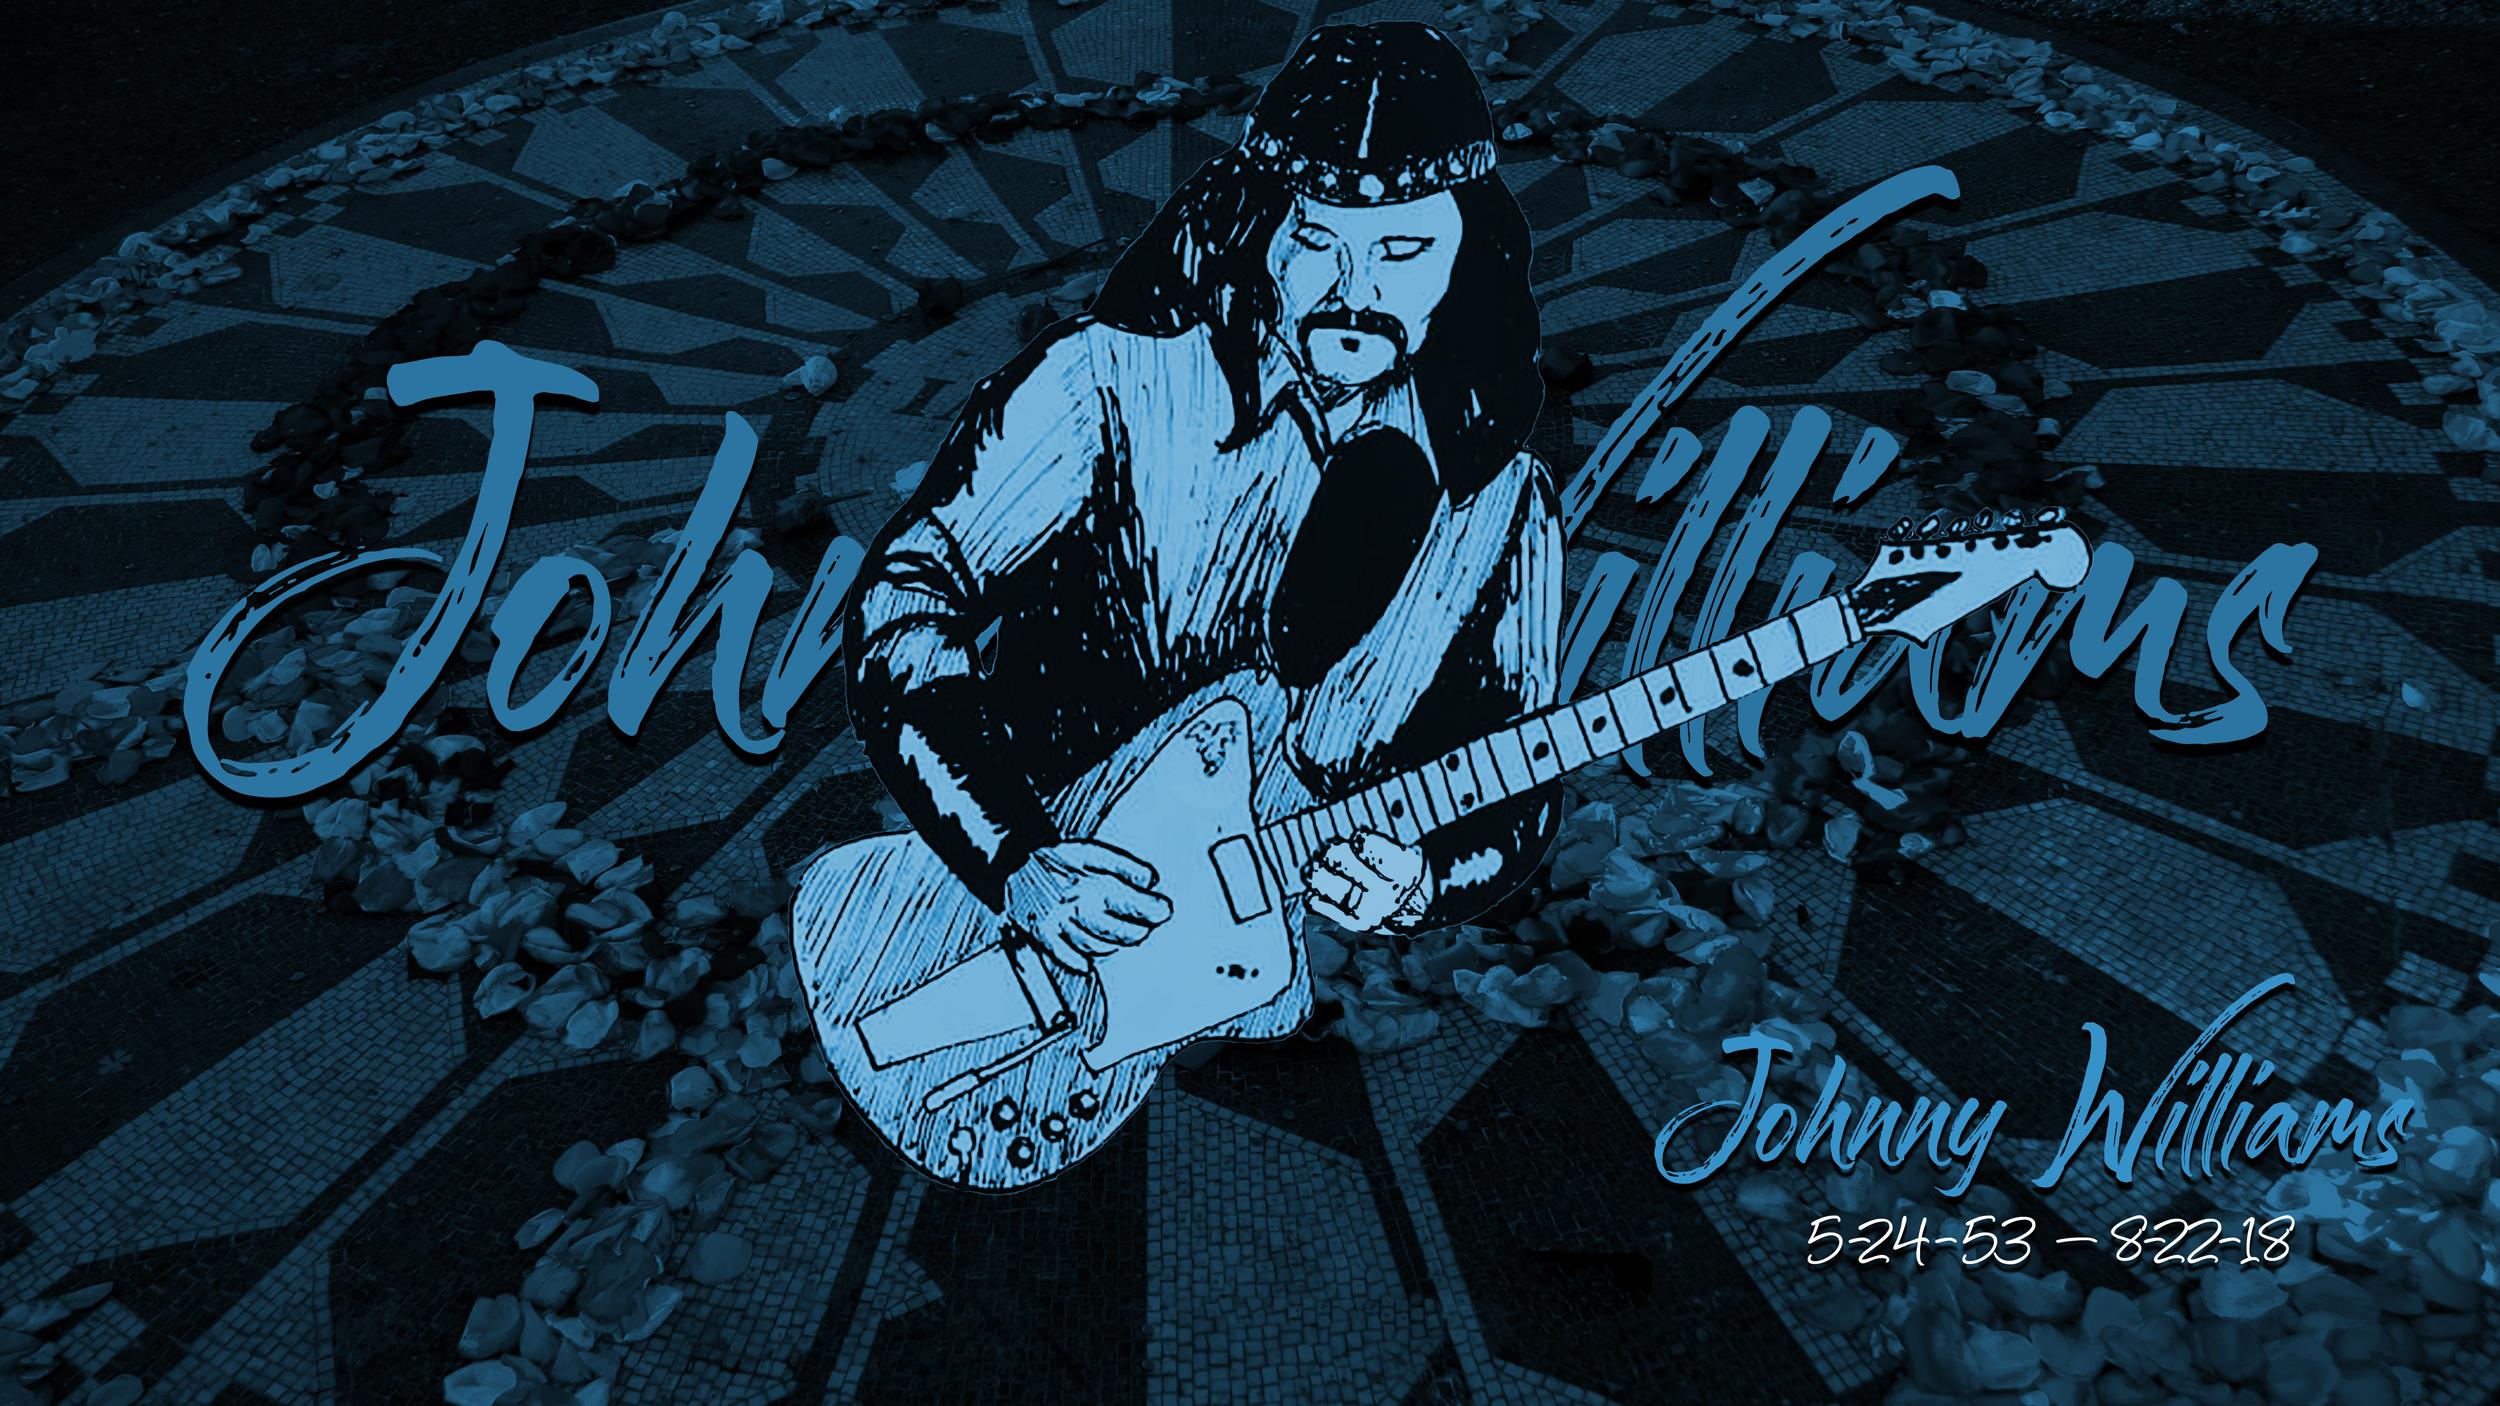 Johnny Memorial Life dates